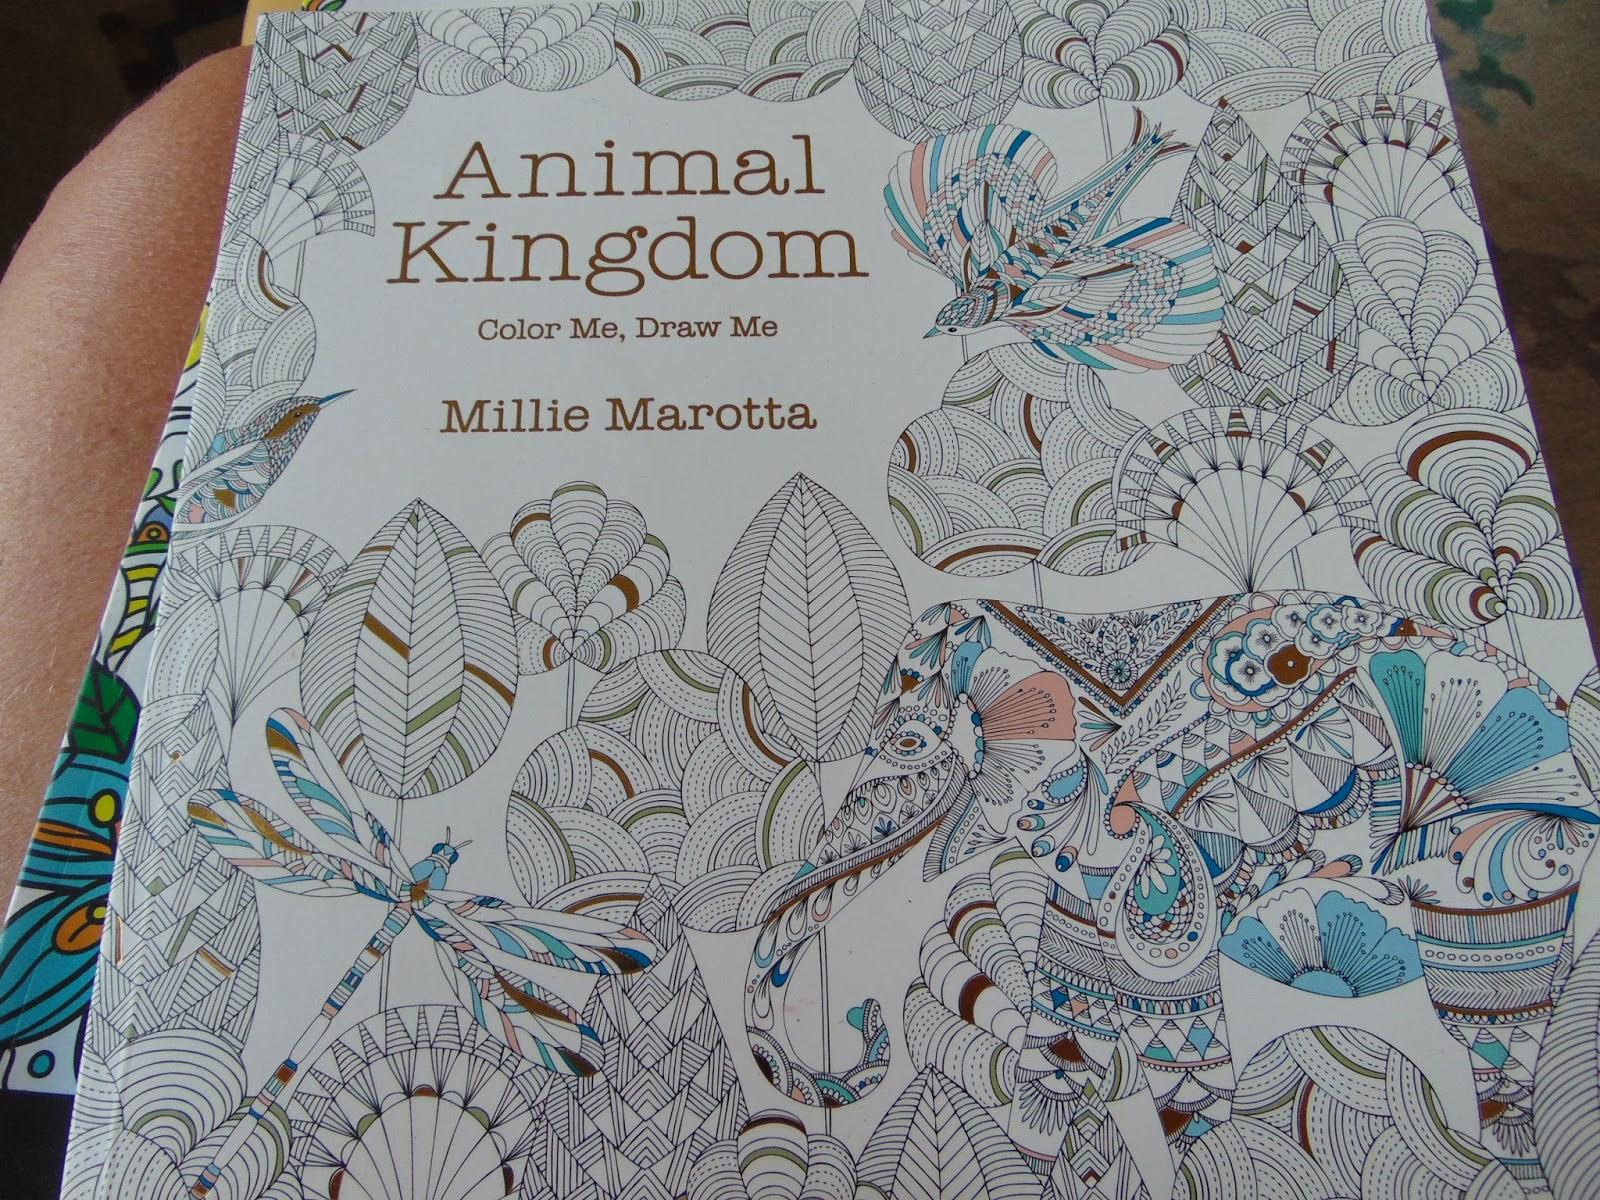 Co color to draw - Animal Kingdom Color Me Draw Me